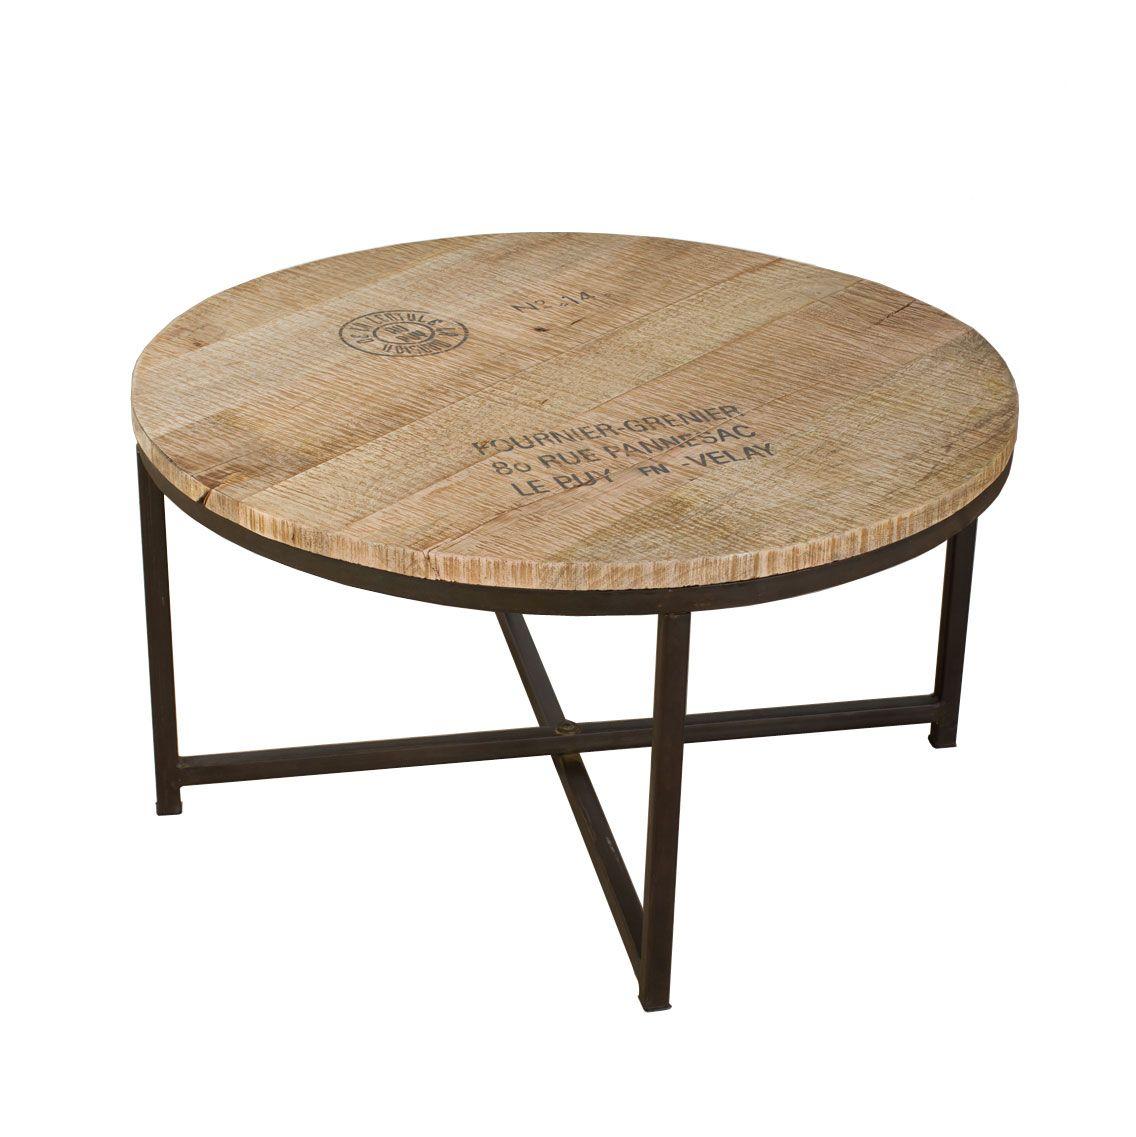 Soho Coffee Table Round Coffee Table Round Wood Coffee Table Coffee Table [ 1137 x 1136 Pixel ]